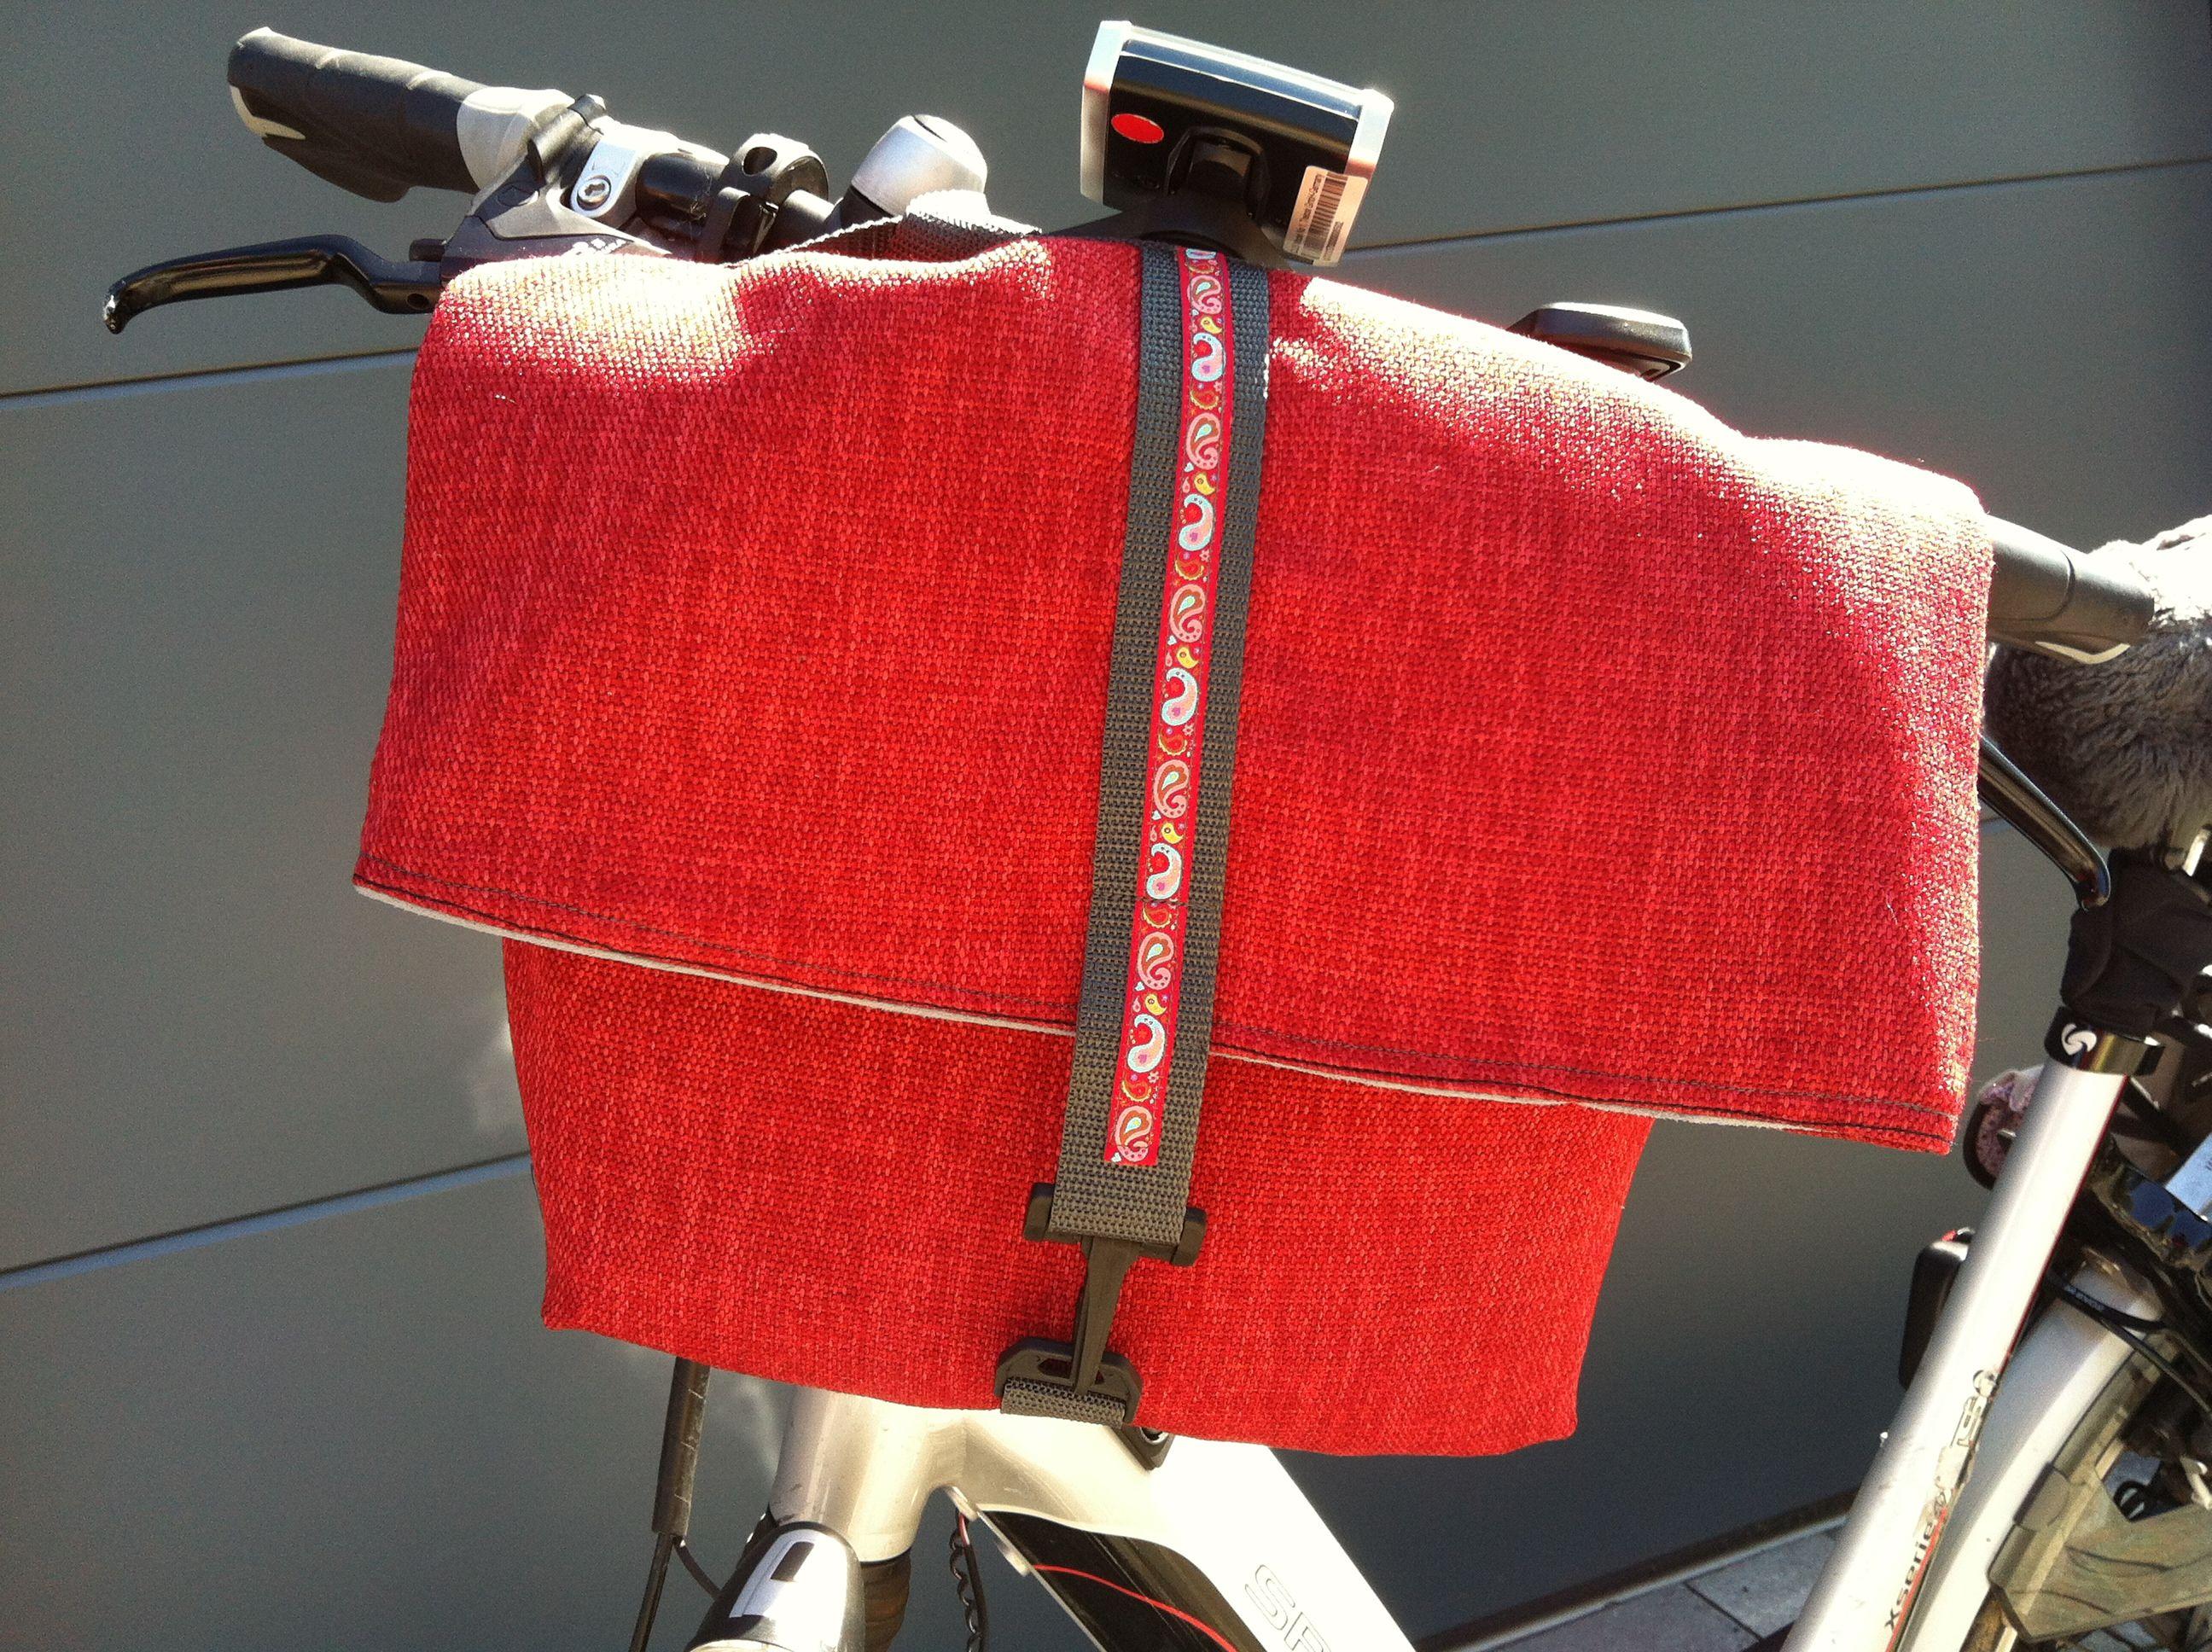 fahrradtasche f r den lenker selbstgemachtes pinterest fahrradtasche n hen und fahrr der. Black Bedroom Furniture Sets. Home Design Ideas